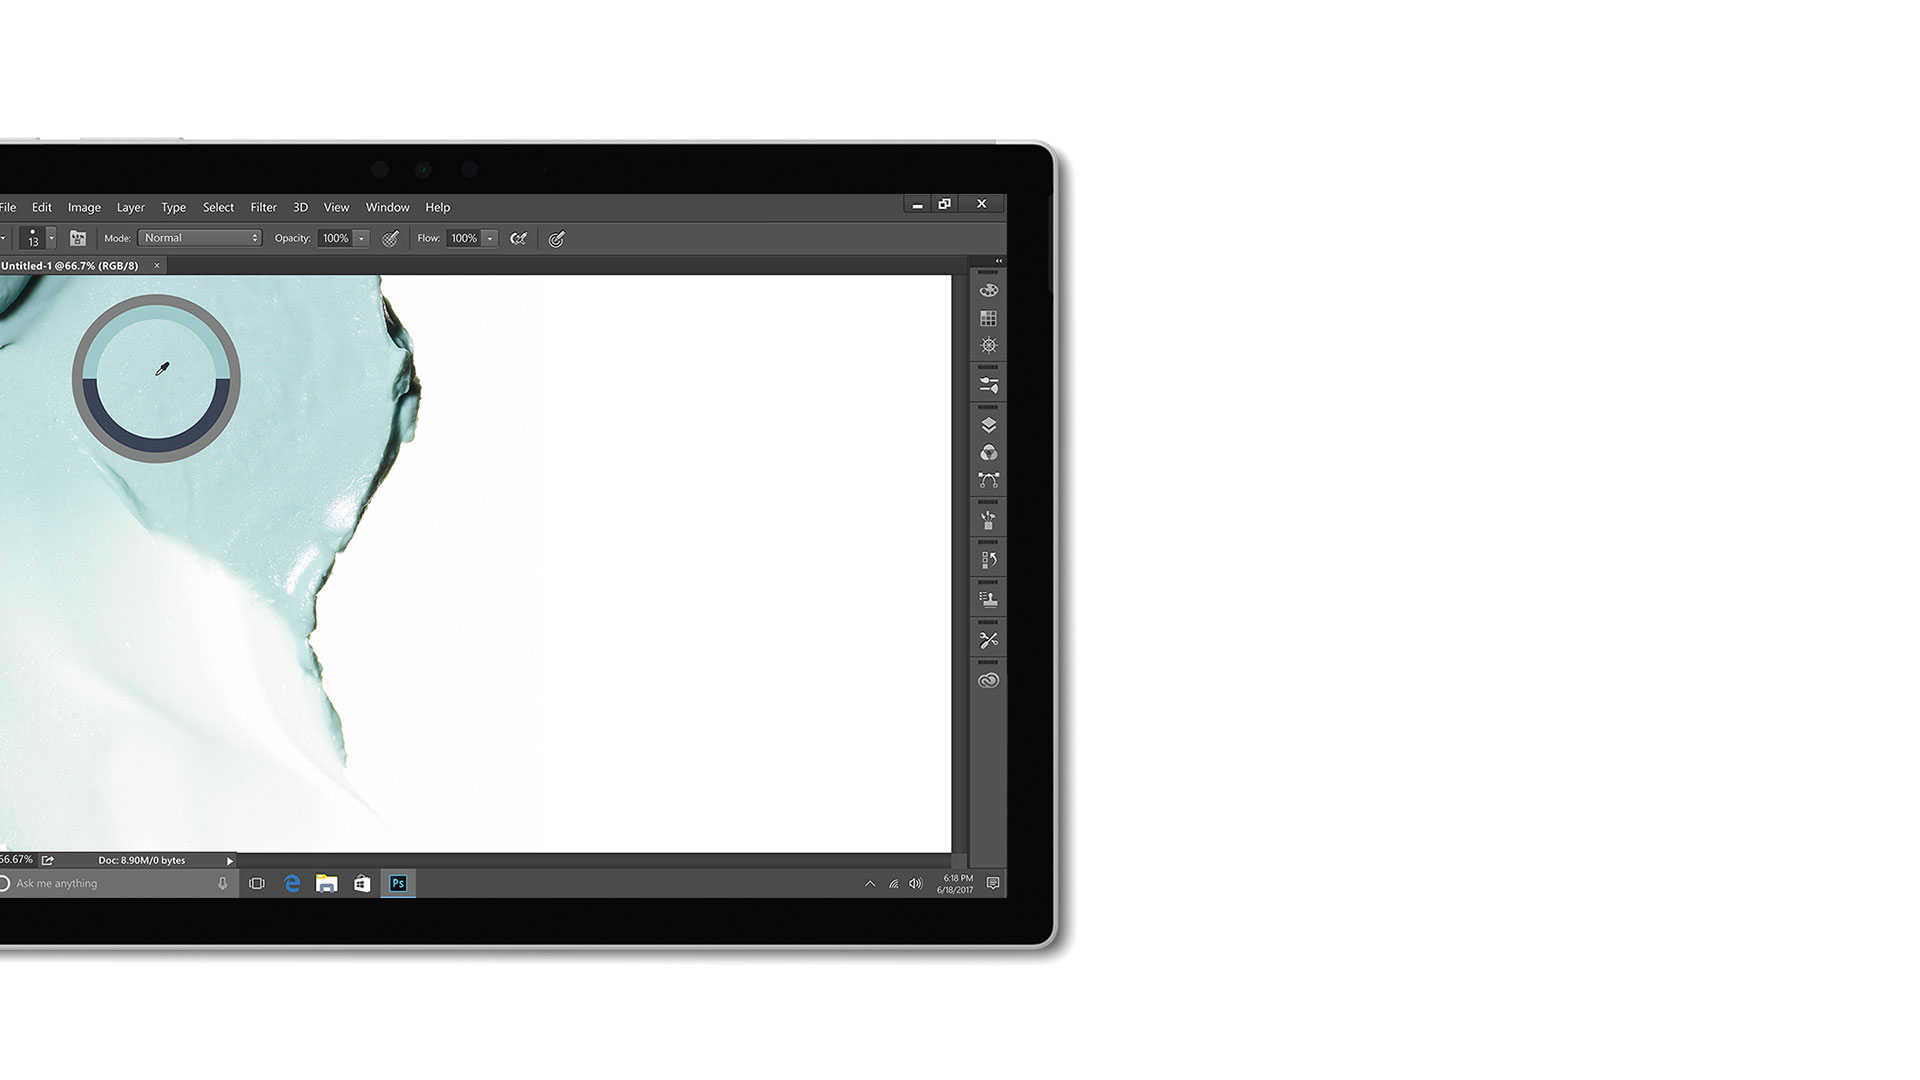 Afbeelding van gebruikersinterface van Adobe Creative Cloud